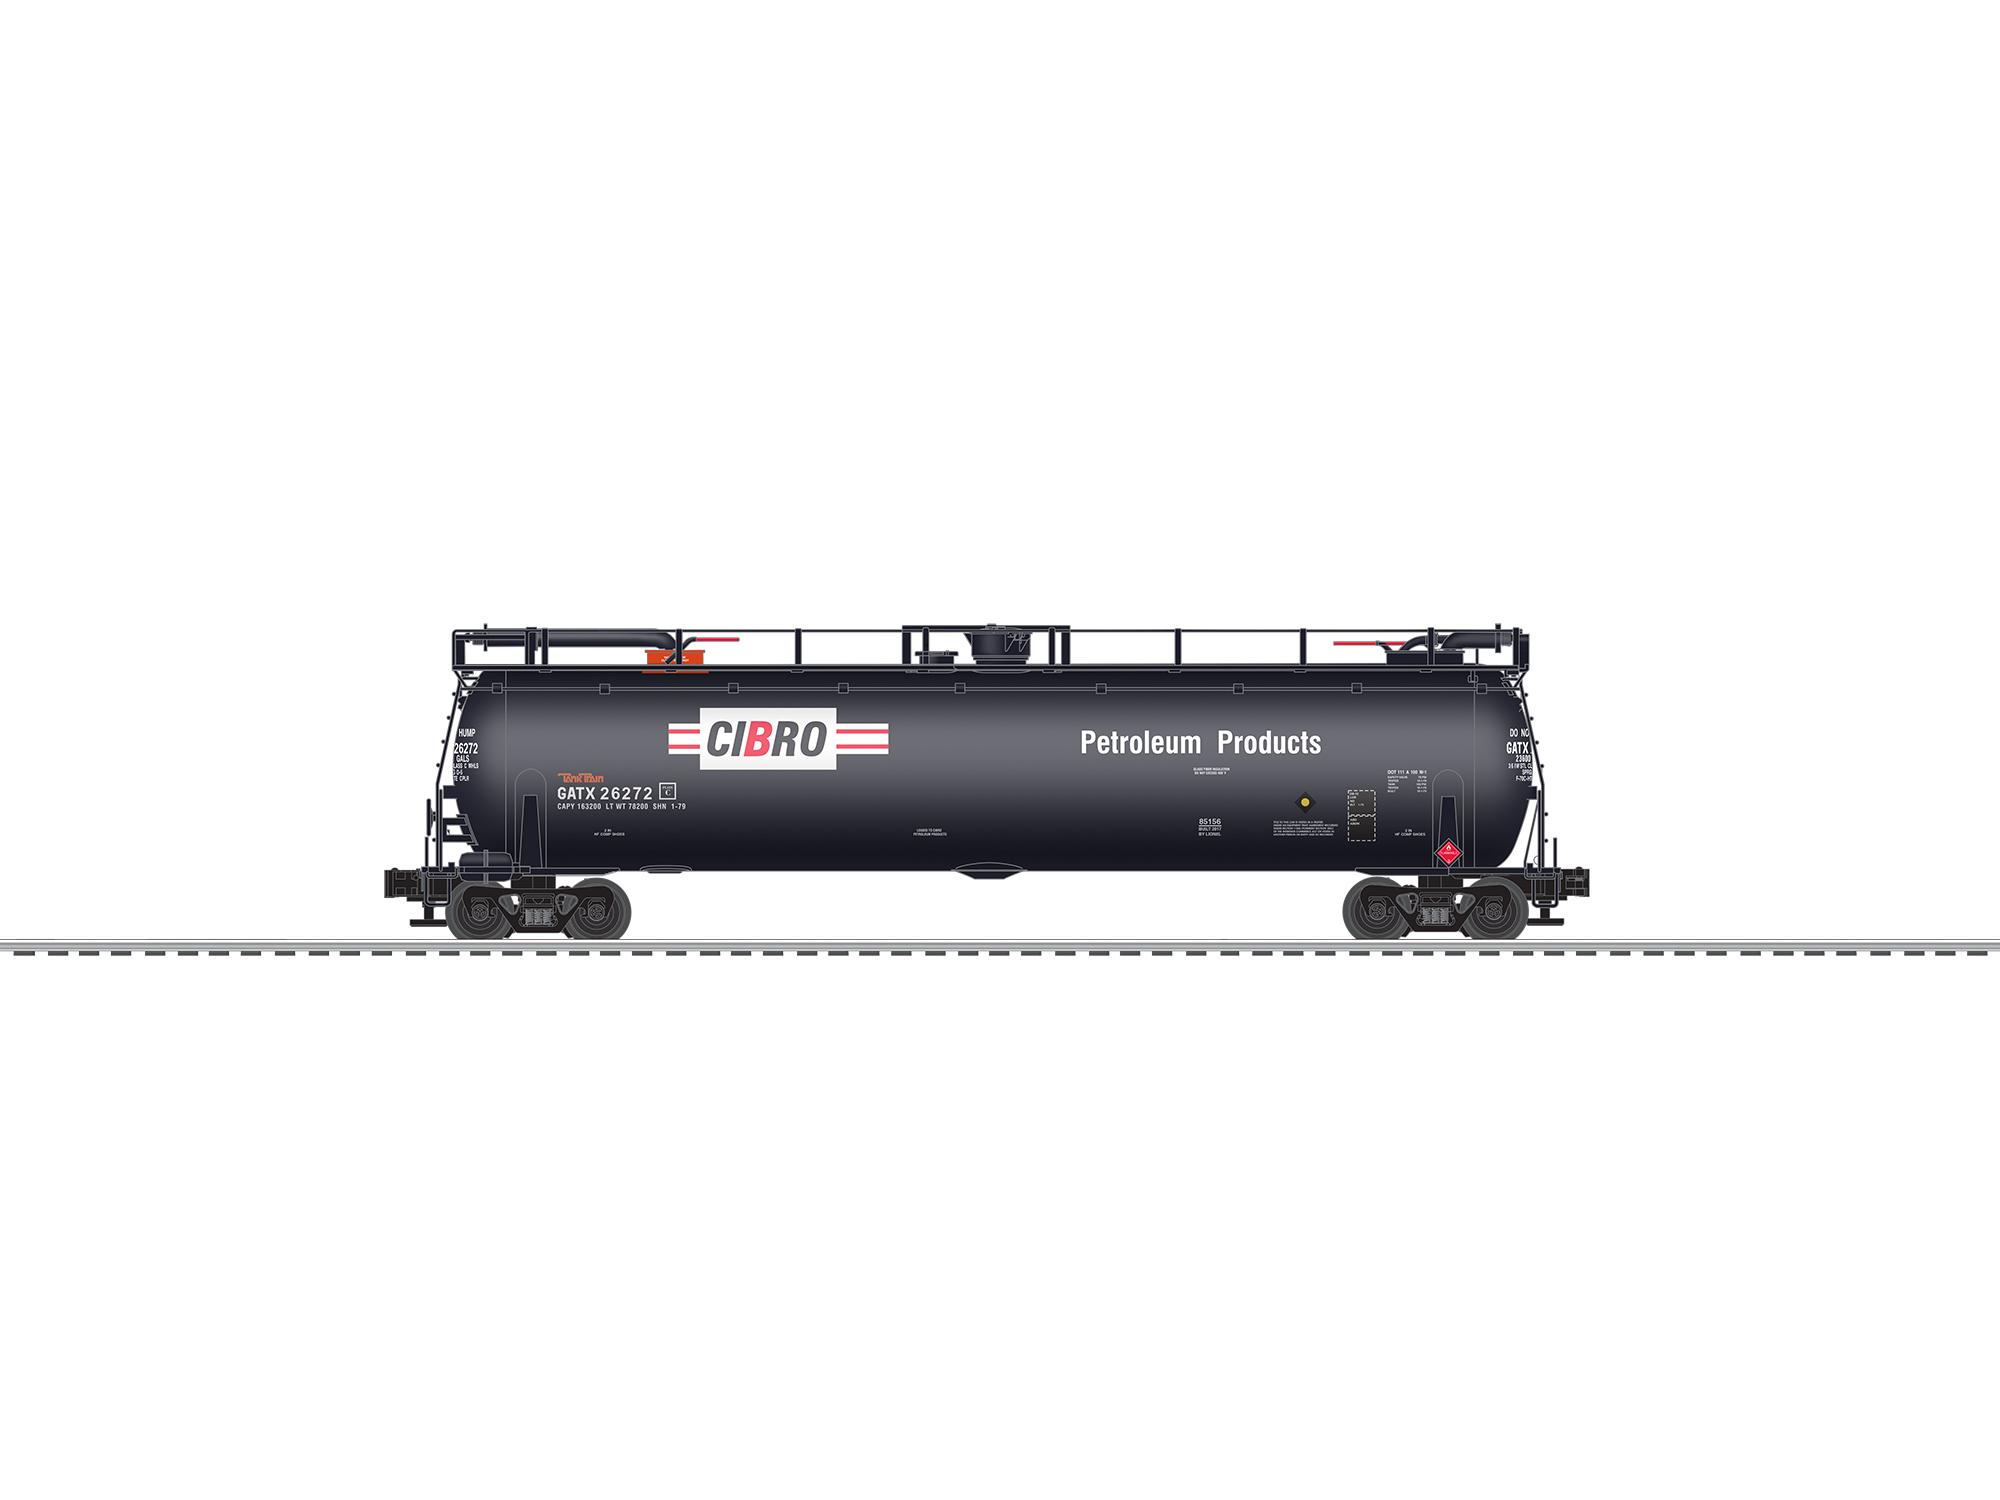 LNL685120 Lionel O TankTrain w/EOT, Cibro (2)